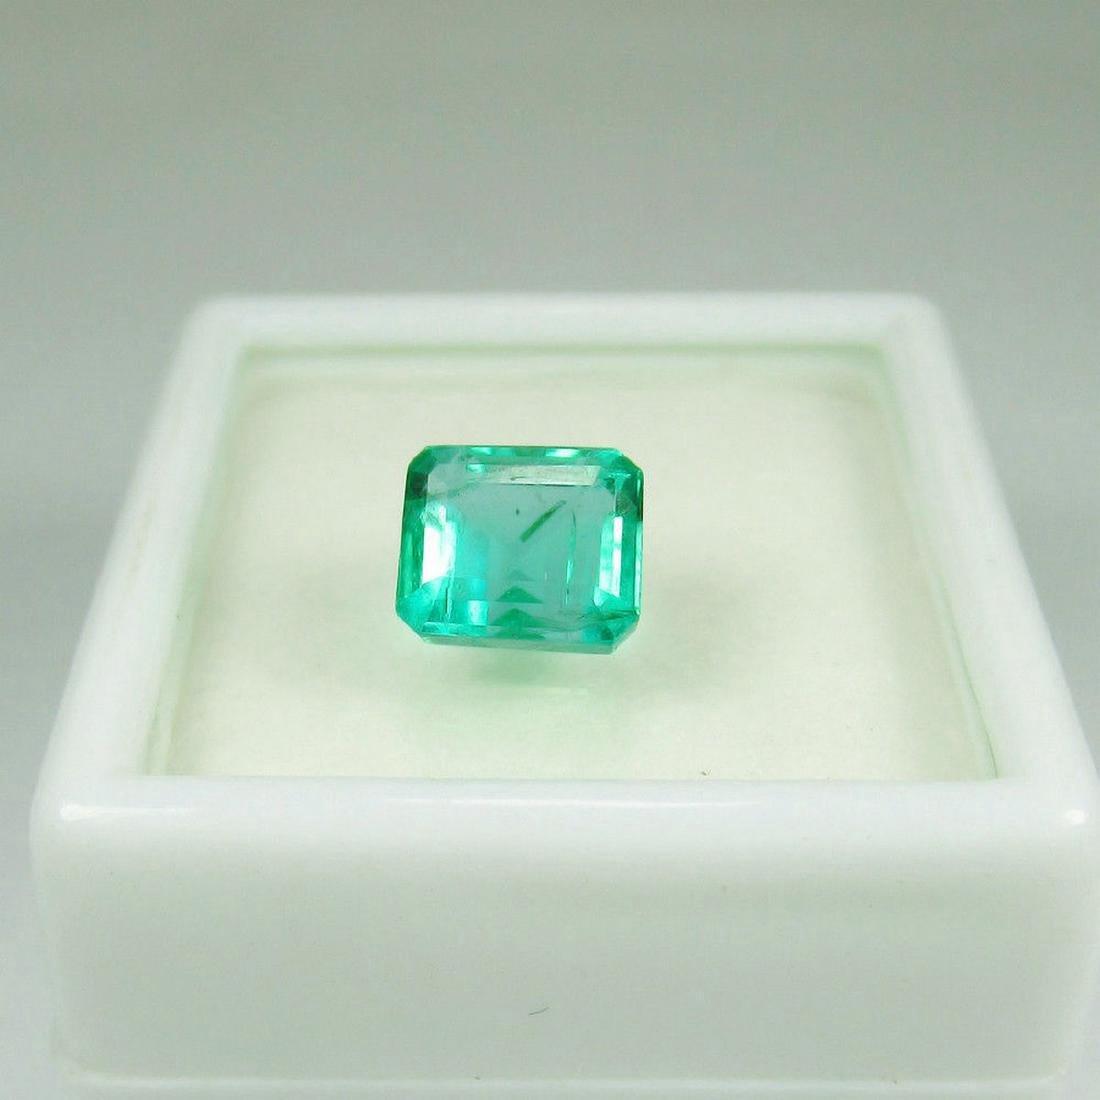 1.77 Carat Loose Zambian Emerald Octagon Stone